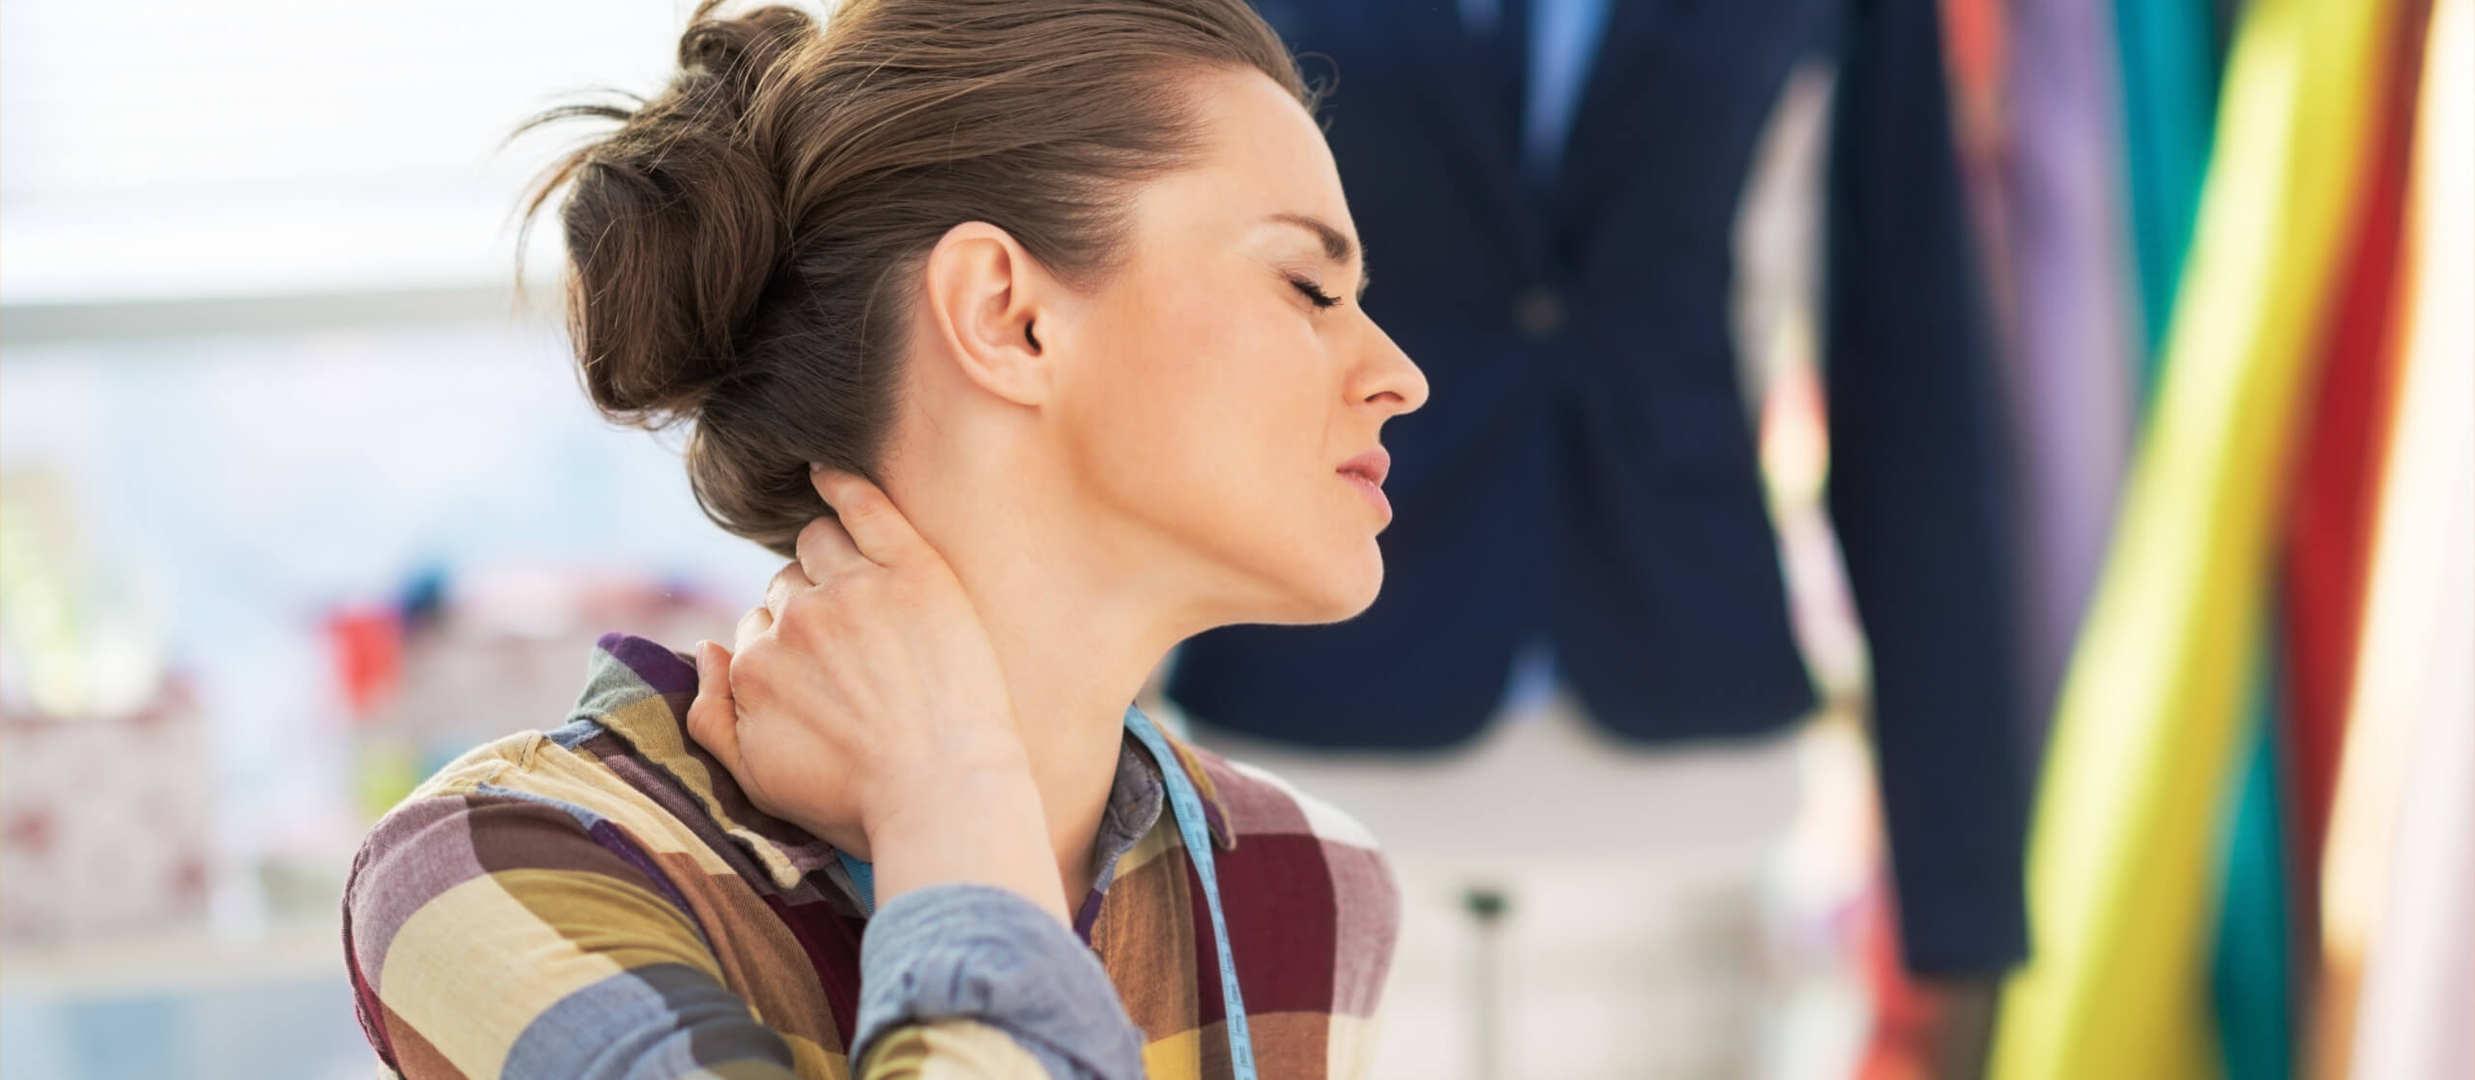 neck-pain-4-2560-x-1117.jpg